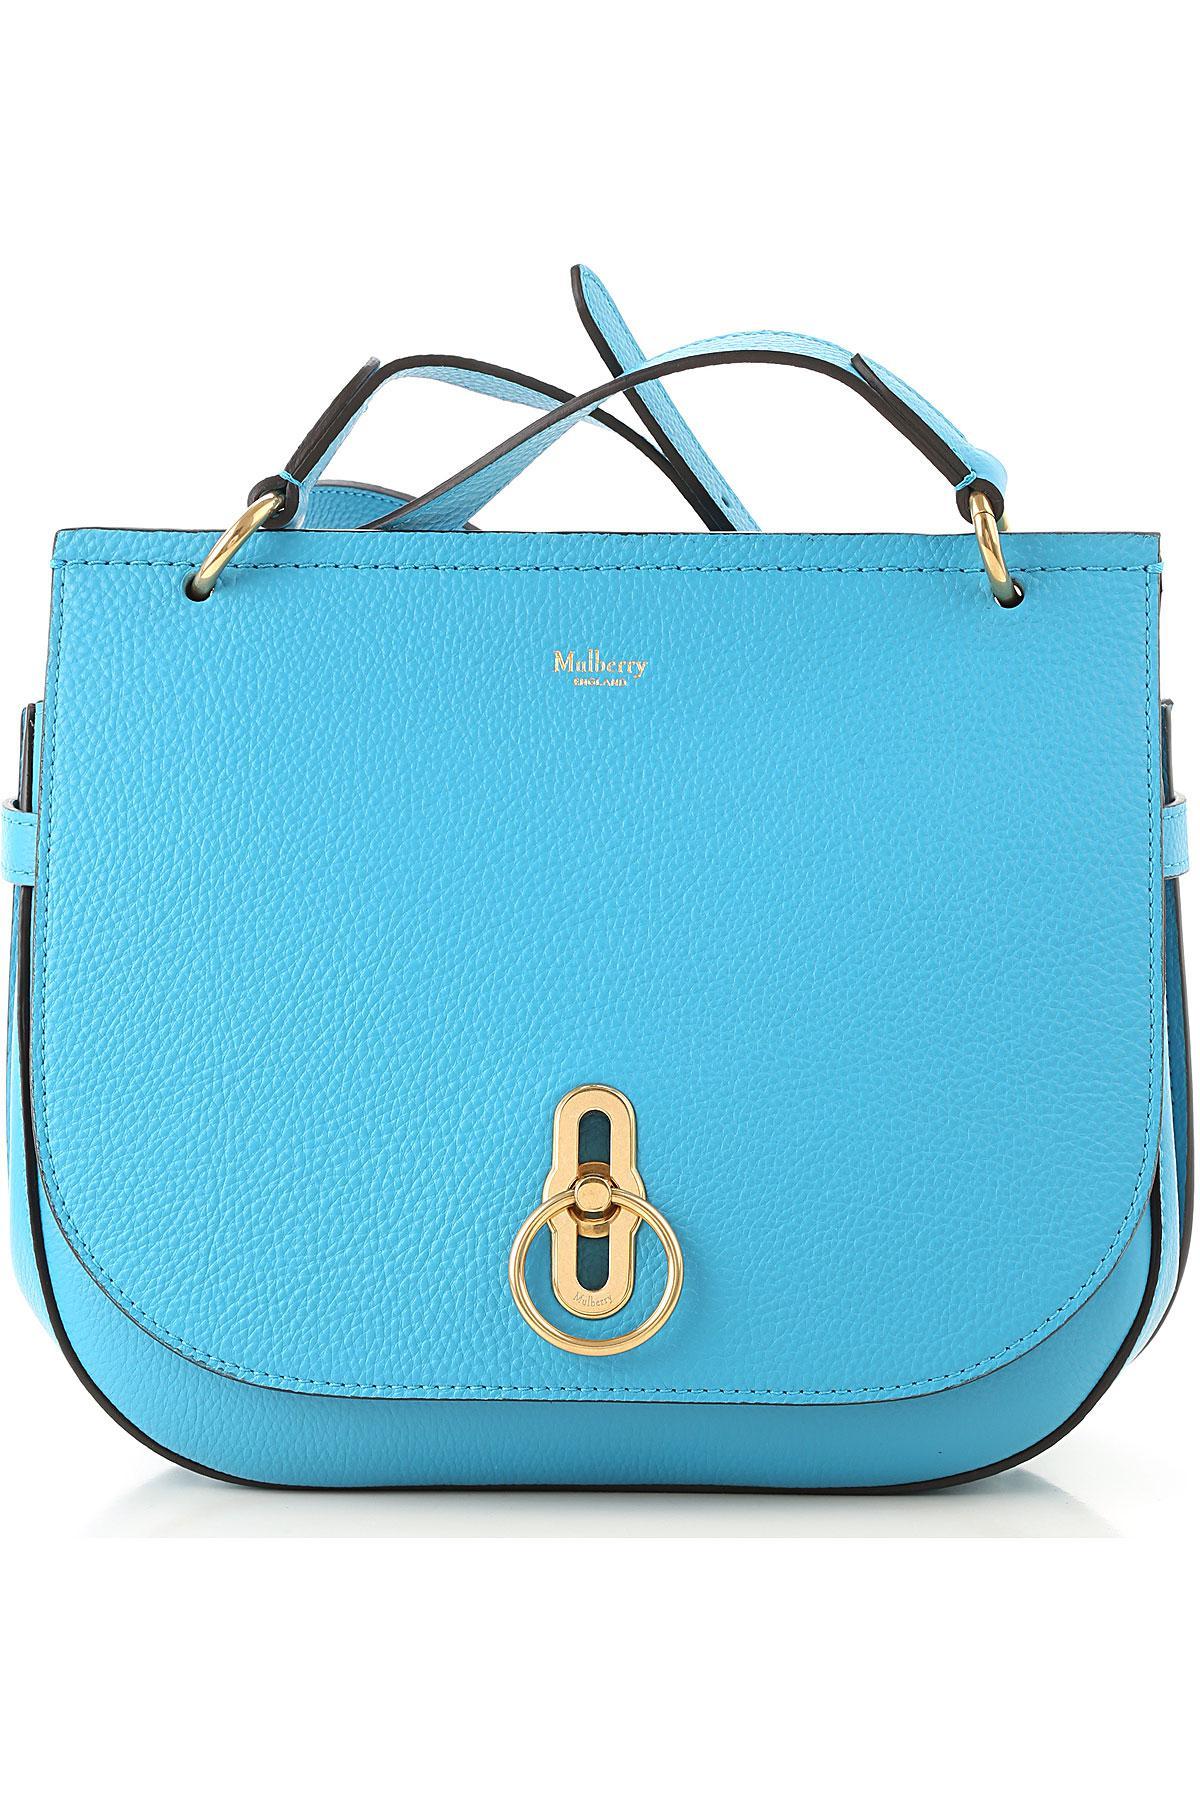 ffaa5913228a Mulberry Handbags in Blue - Lyst